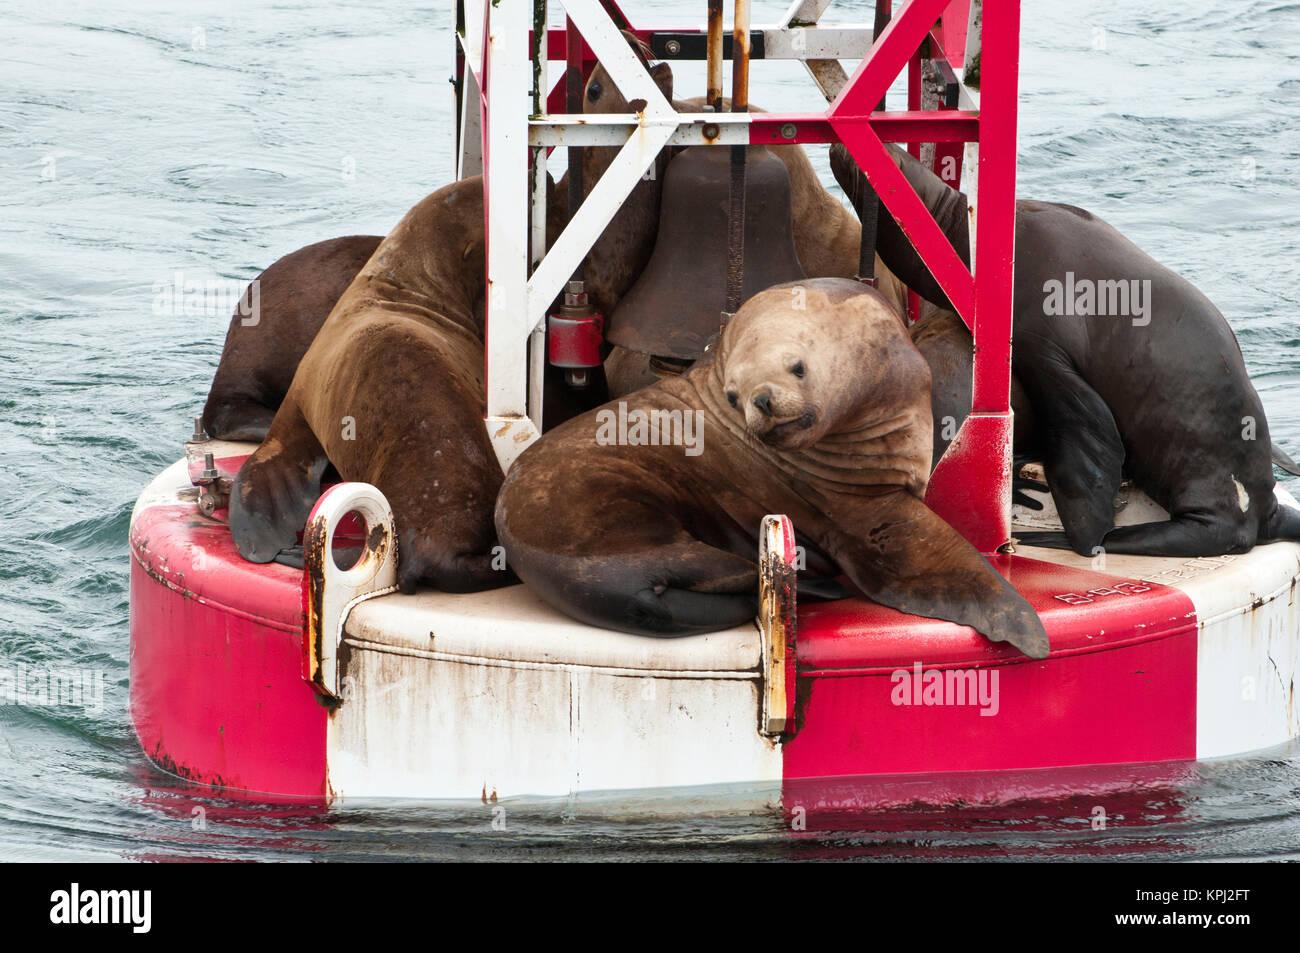 US, AK, Inside Passage. Stellar Sea Lions (Eumetopias jubatus) crowd on to navigation buoy. - Stock Image